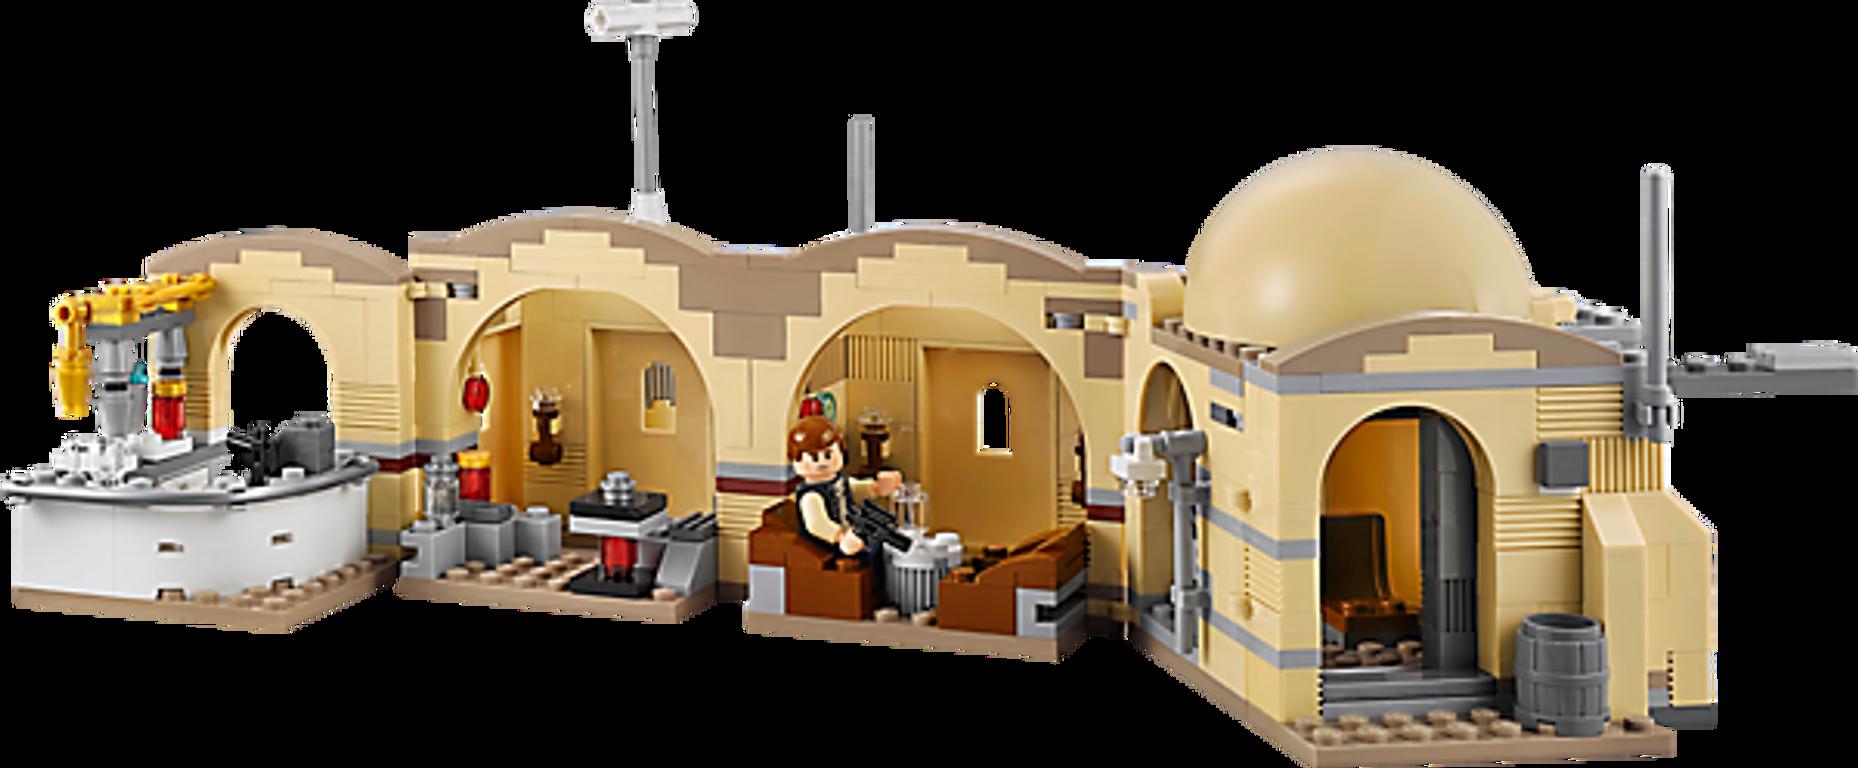 LEGO® Star Wars Mos Eisley Cantina interior